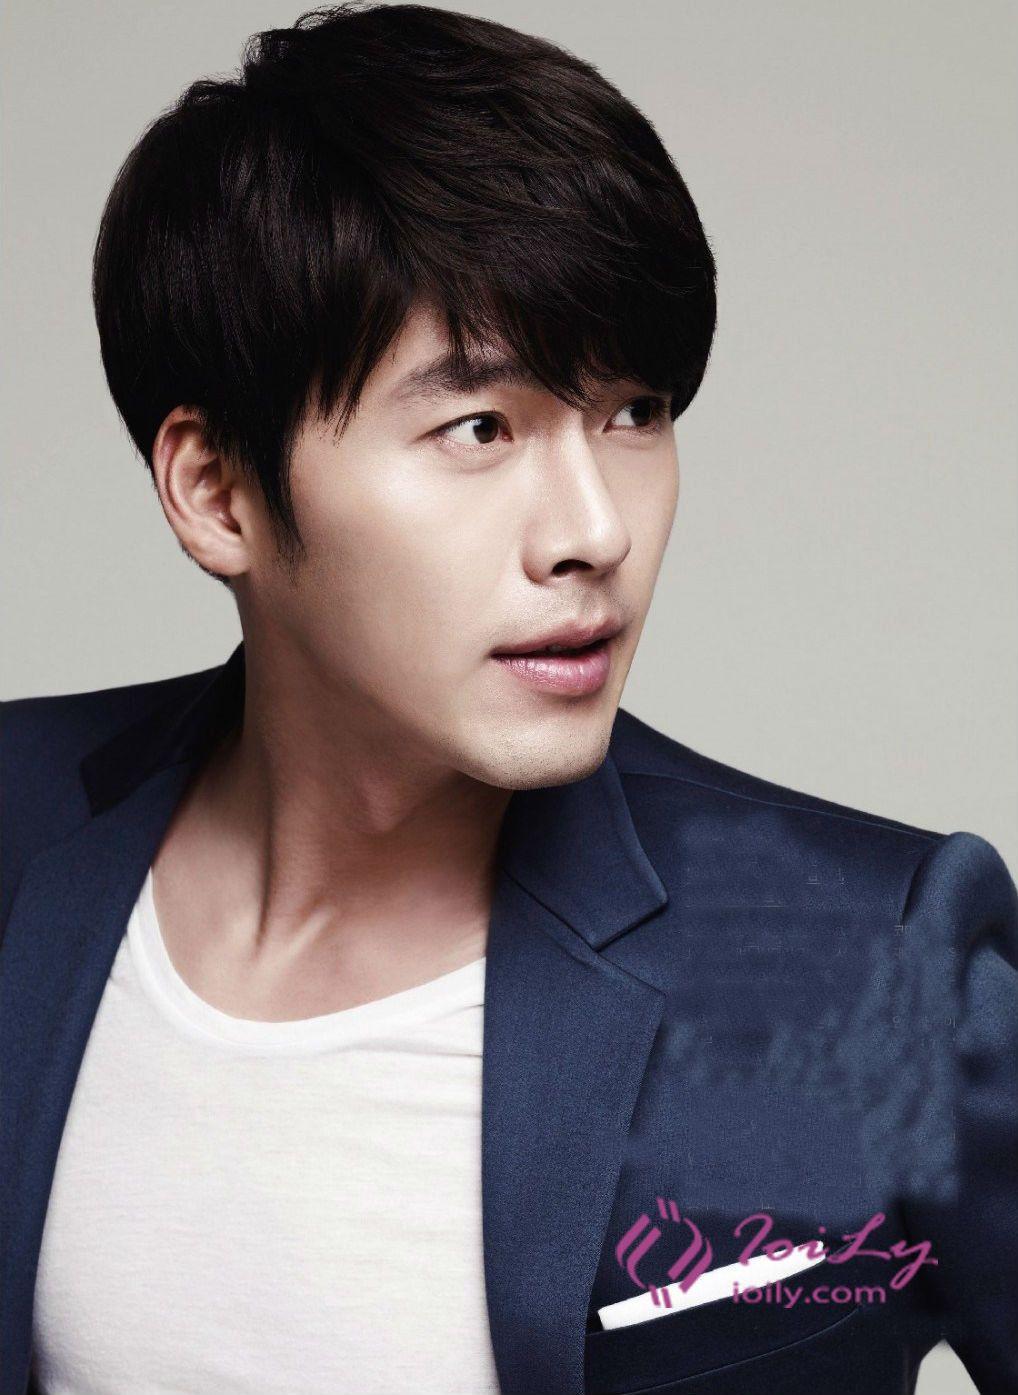 Astounding Korean Hairstyles Men Short Hair And For Men On Pinterest Short Hairstyles Gunalazisus